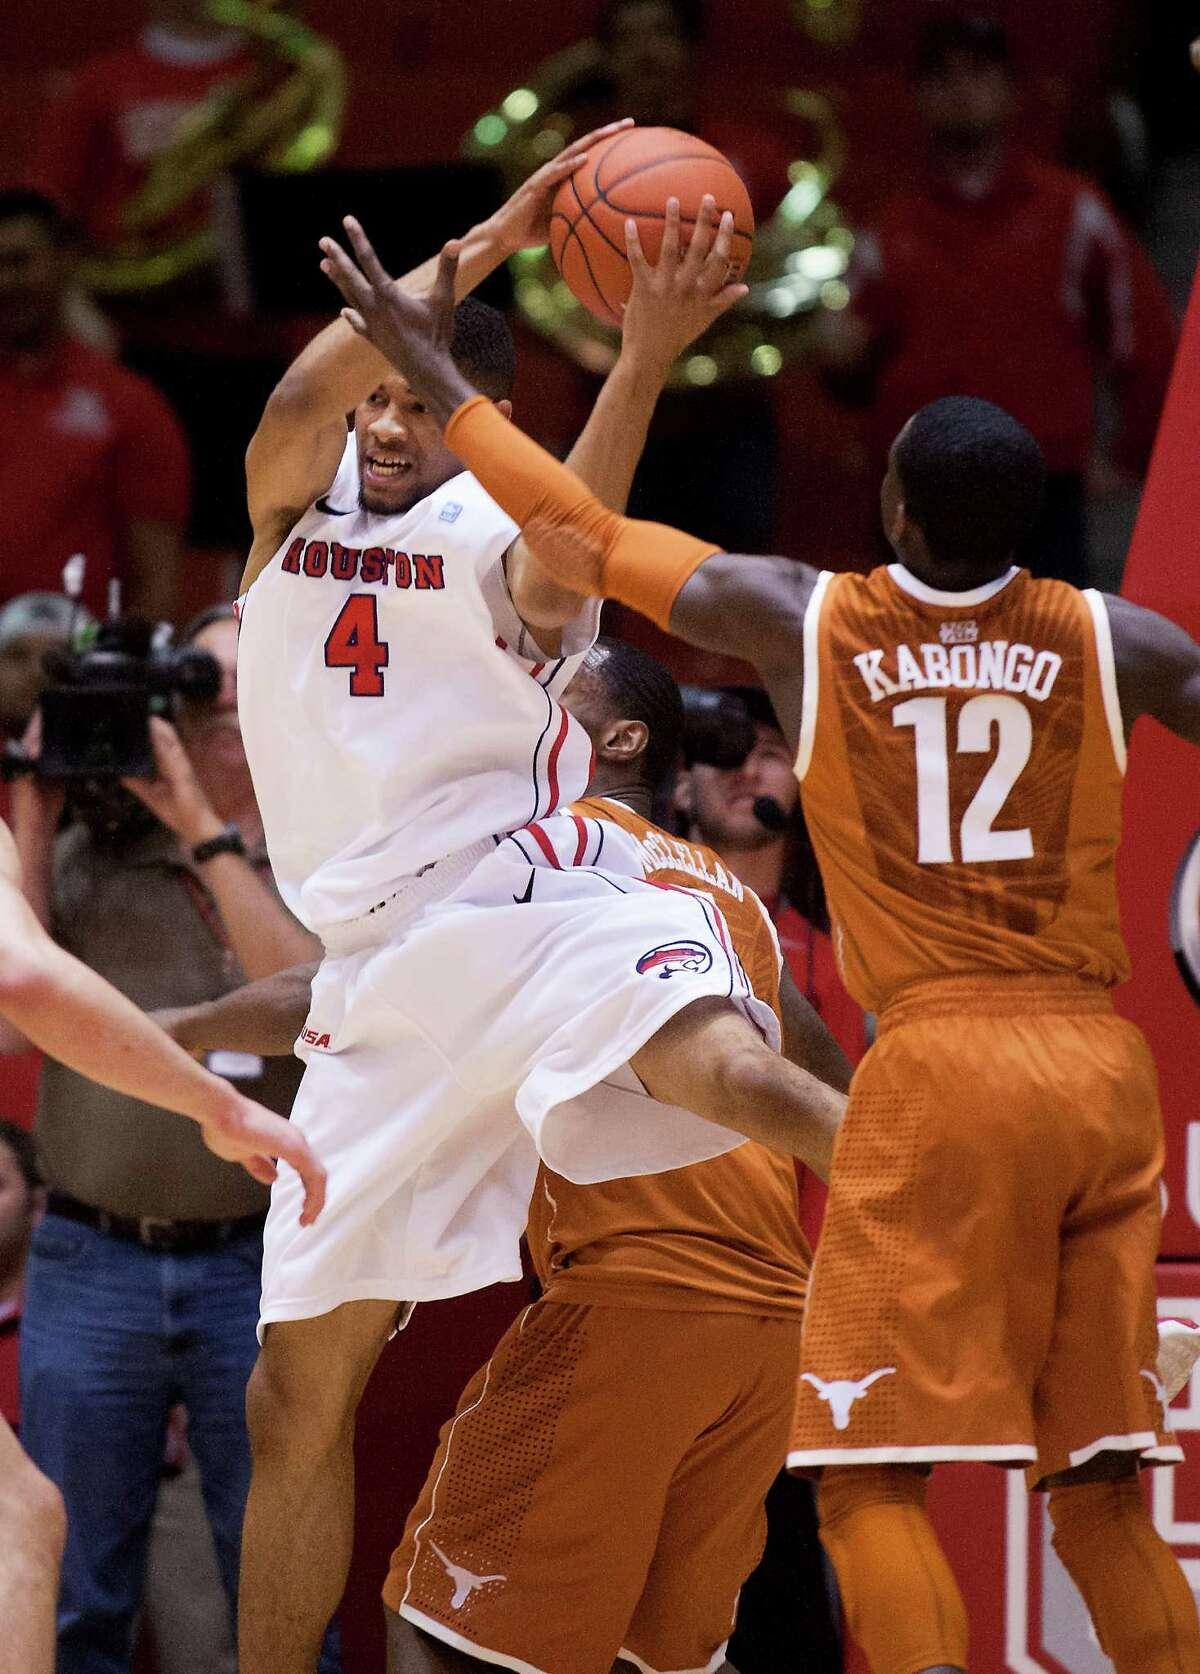 U of H guard LeRon Barnes (4) brings down a rebound against Texas guard Myck Kabongo (12) during the first half of the CBI men's postseason basketball tournament at Hofheinz Pavillion on Wednesday, March 20, 2013, in Houston.